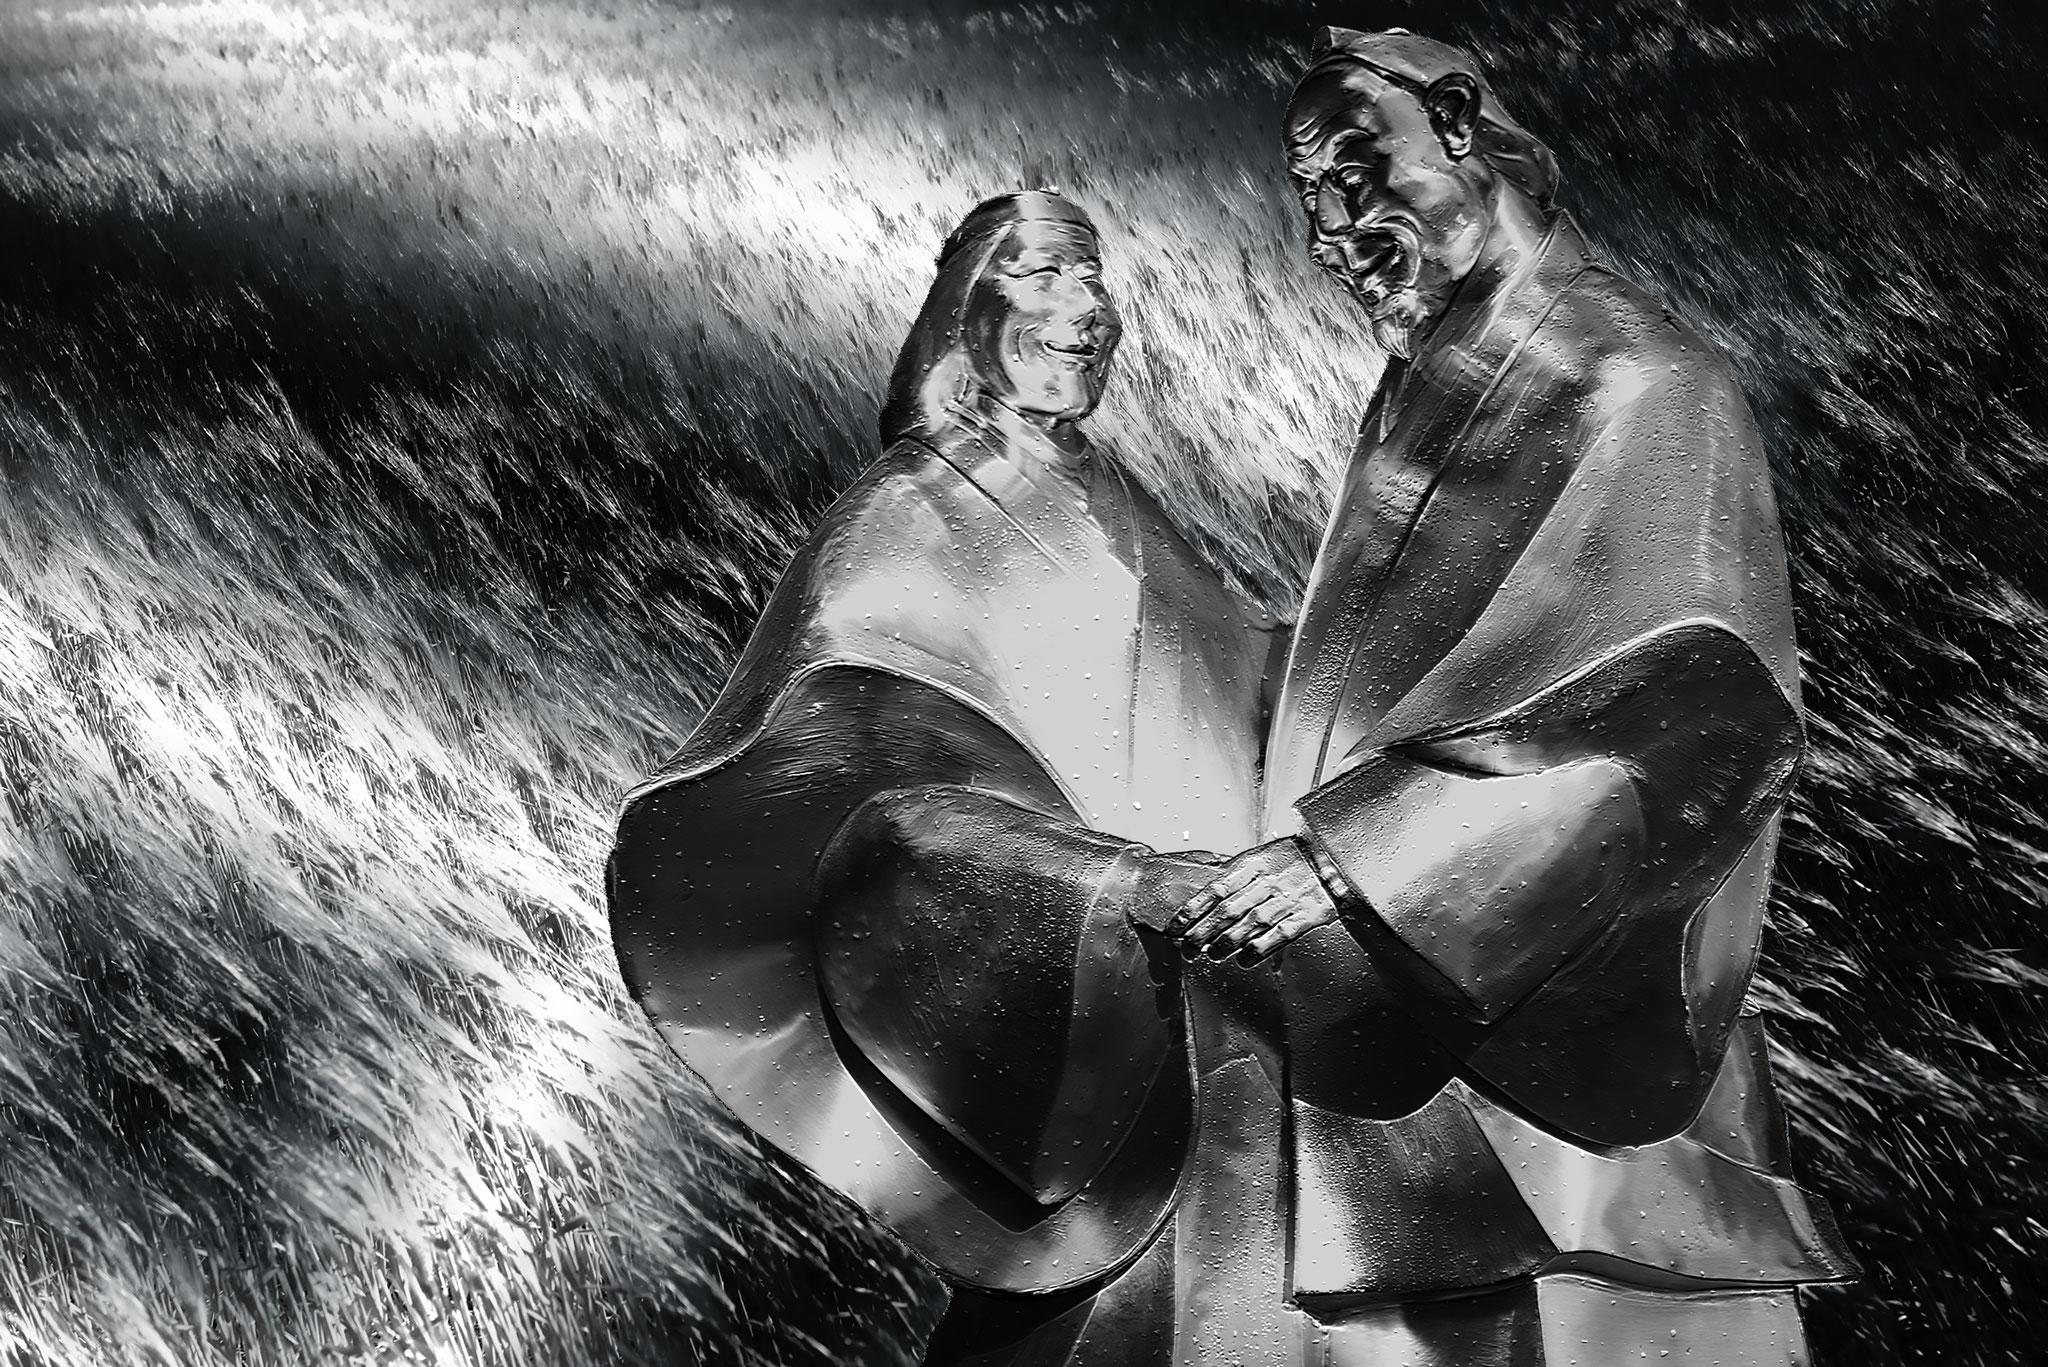 Tazaki  Ryuichi (Japan) - Together  man and  woman